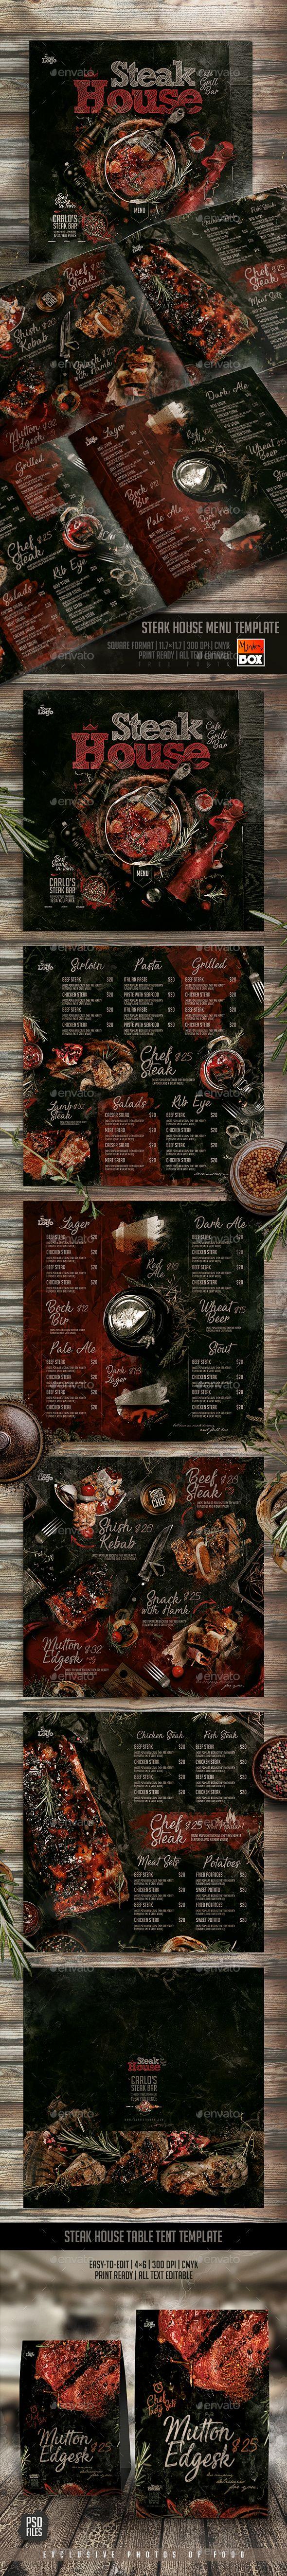 Steak House Menu Template — Photoshop PSD #steak house #italian menu • Download ➝ https://graphicriver.net/item/steak-house-menu-template/21528506?ref=pxcr